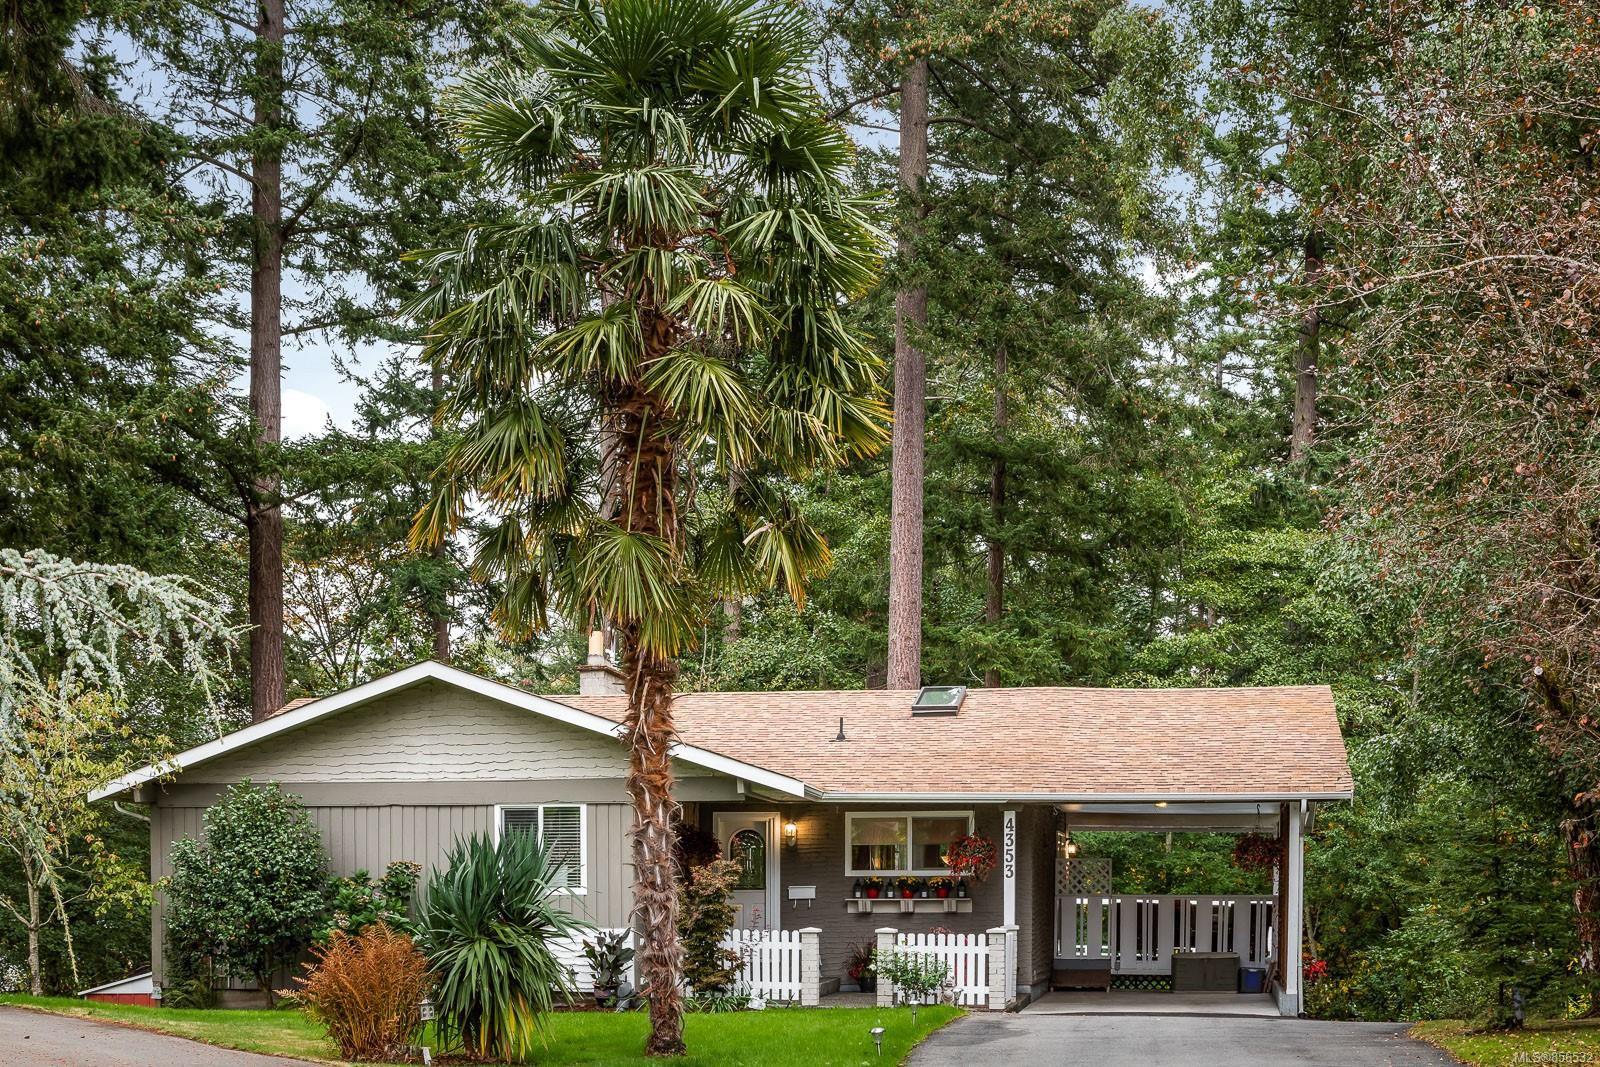 Main Photo: 4353 Northridge Cres in : SW Northridge House for sale (Saanich West)  : MLS®# 856532